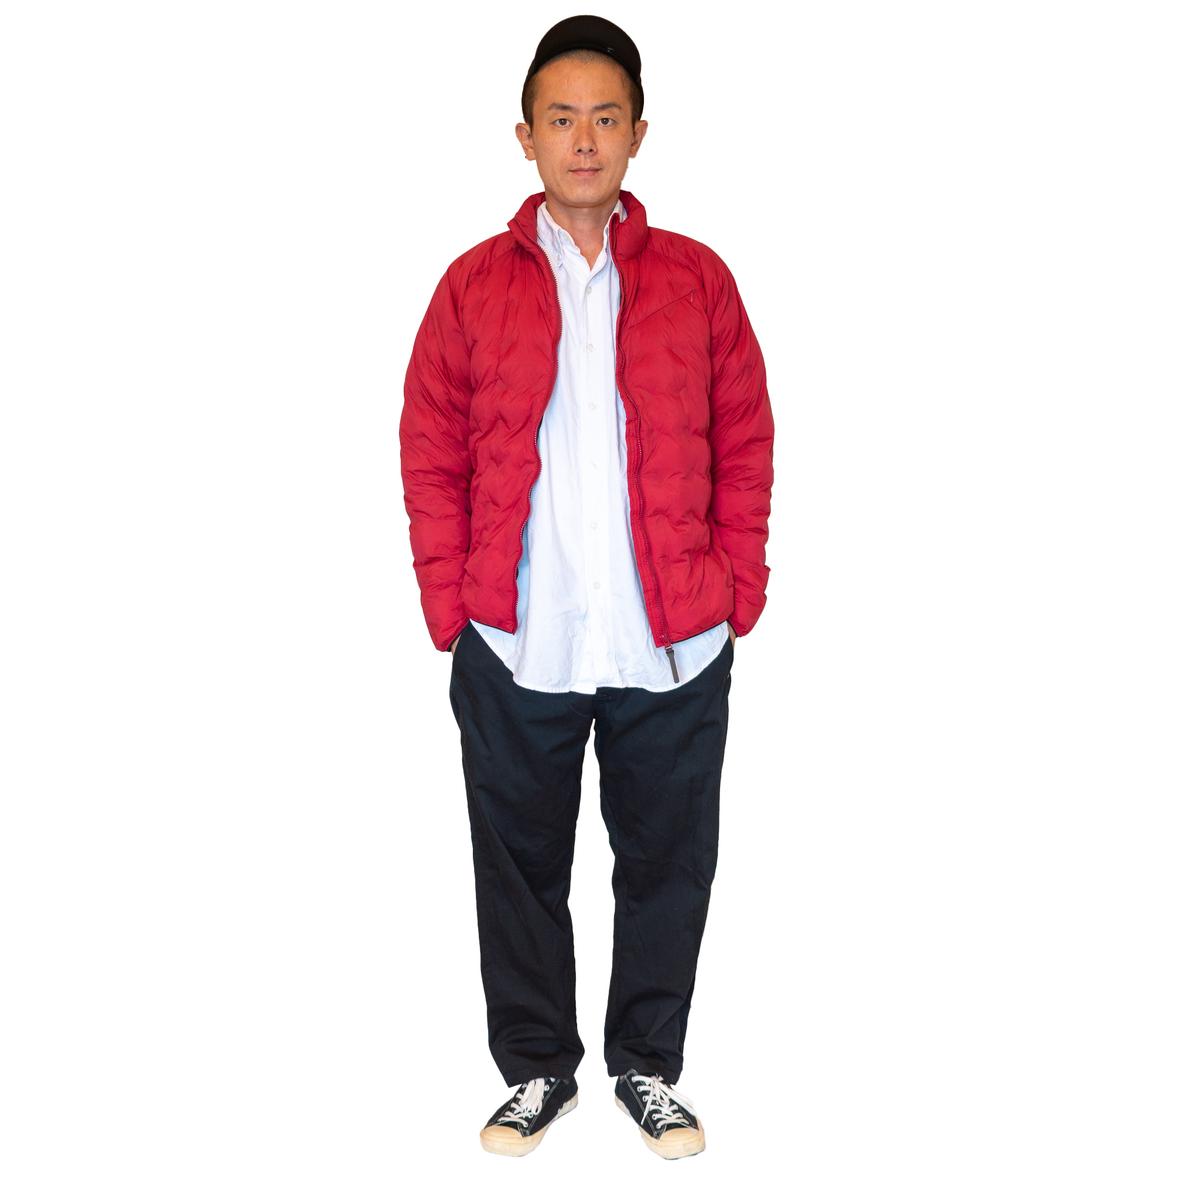 f:id:yamada0221:20210811144456j:plain